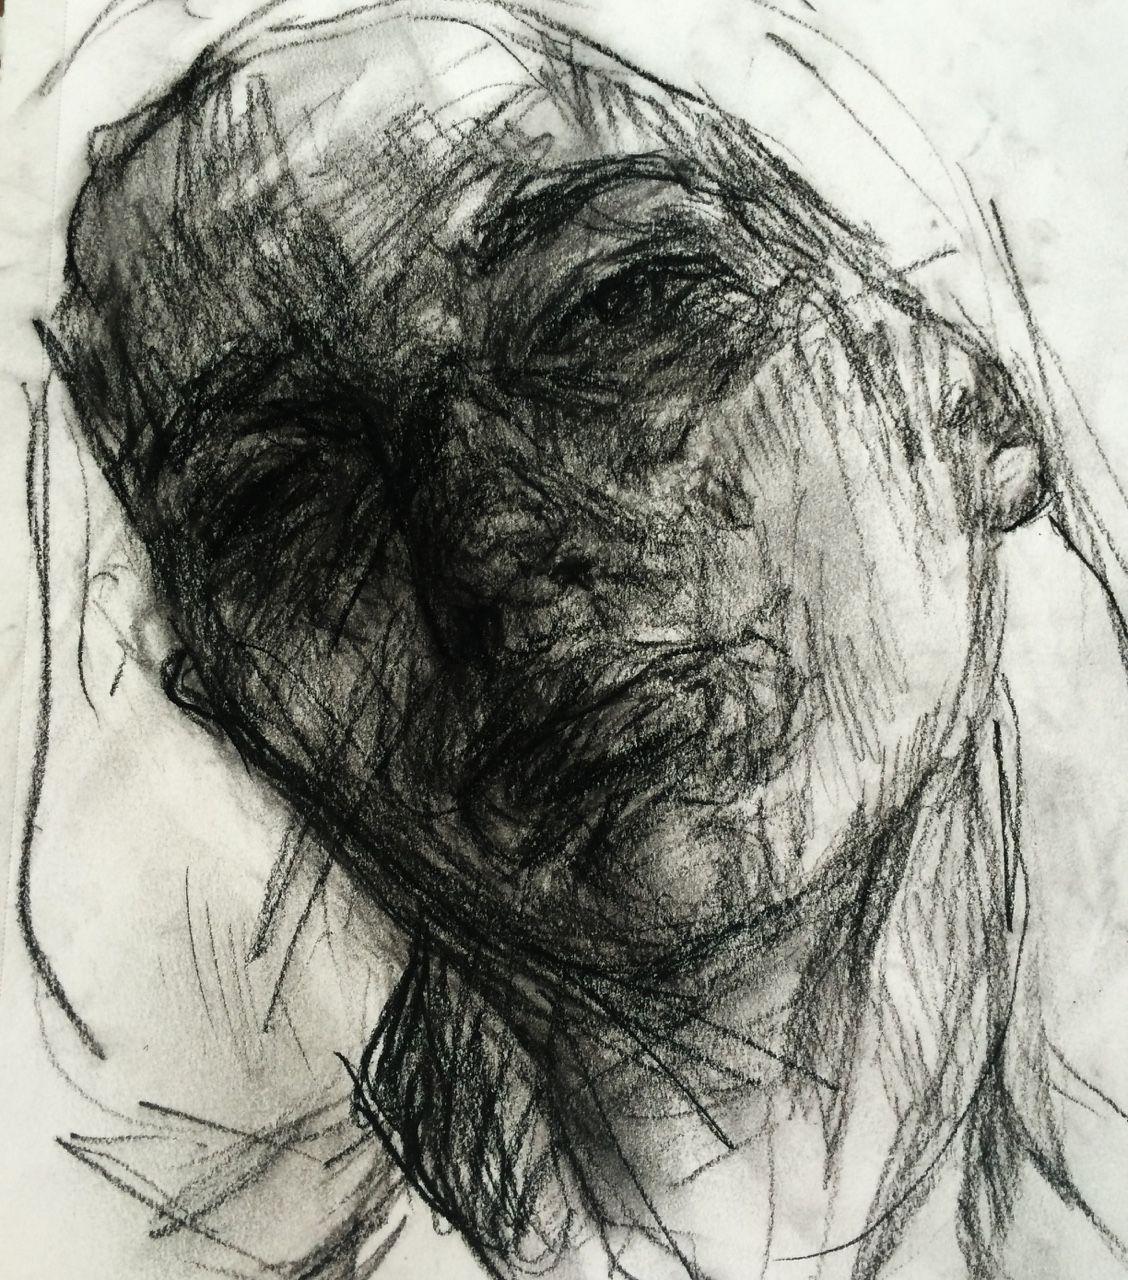 Elly Smallwood - Charcoal self portrait